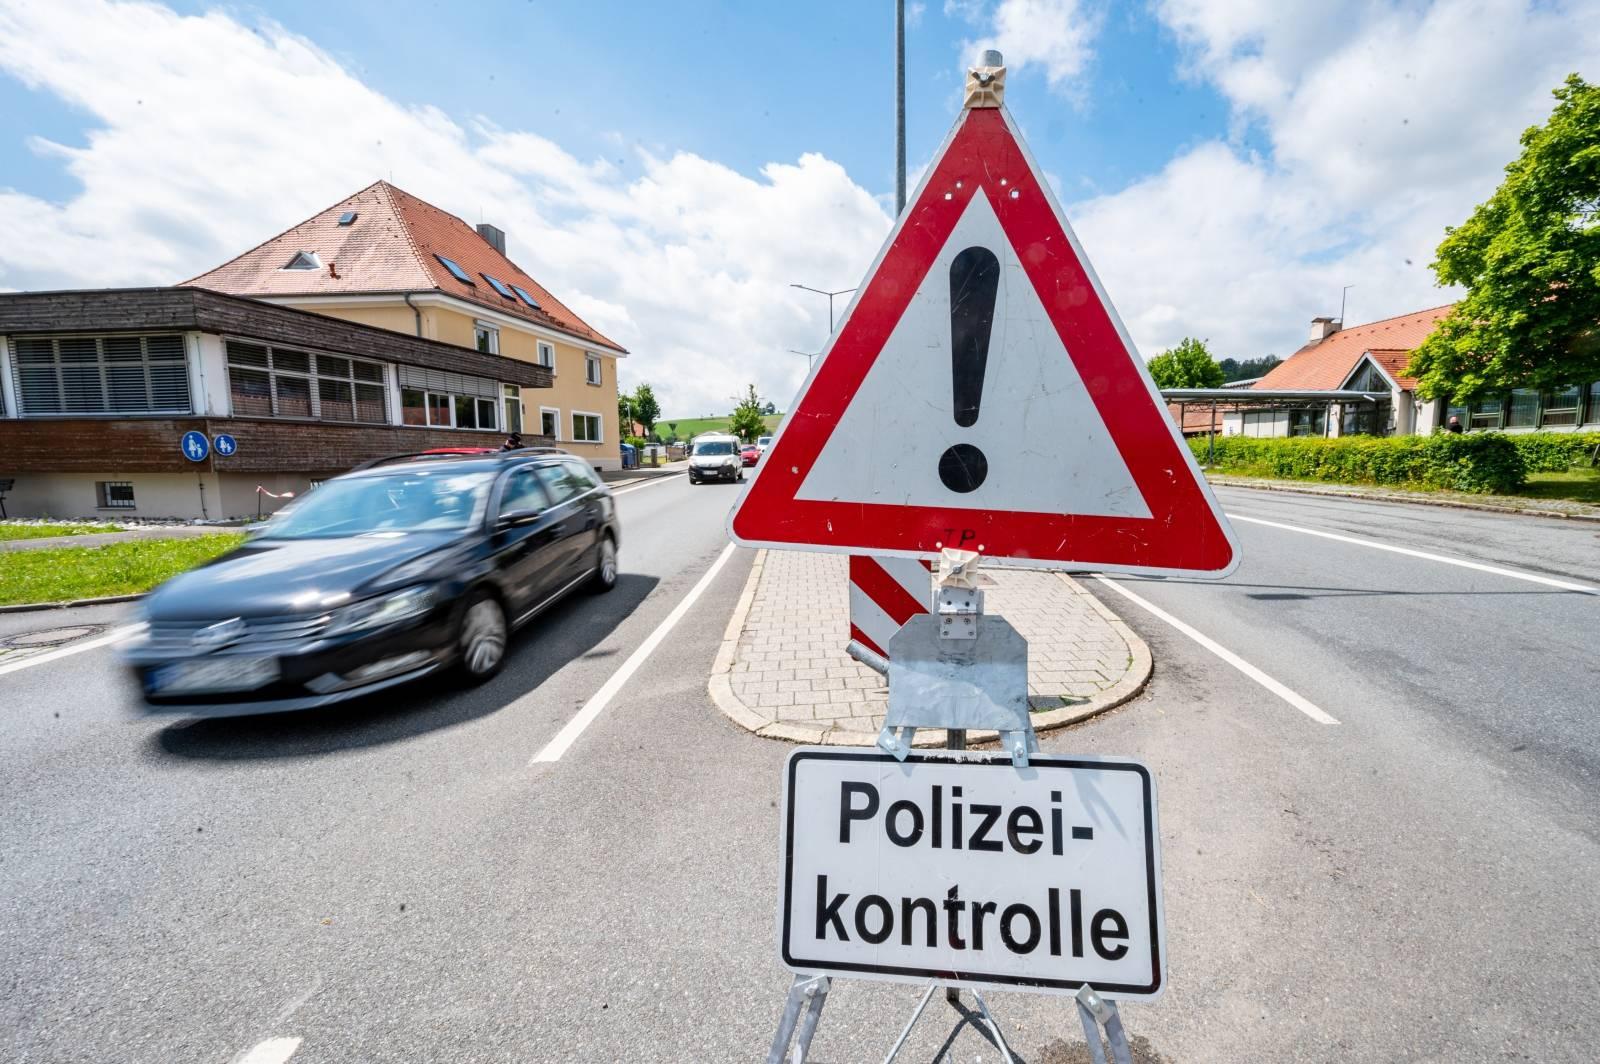 Coronavirus - Czech Republic opens border again